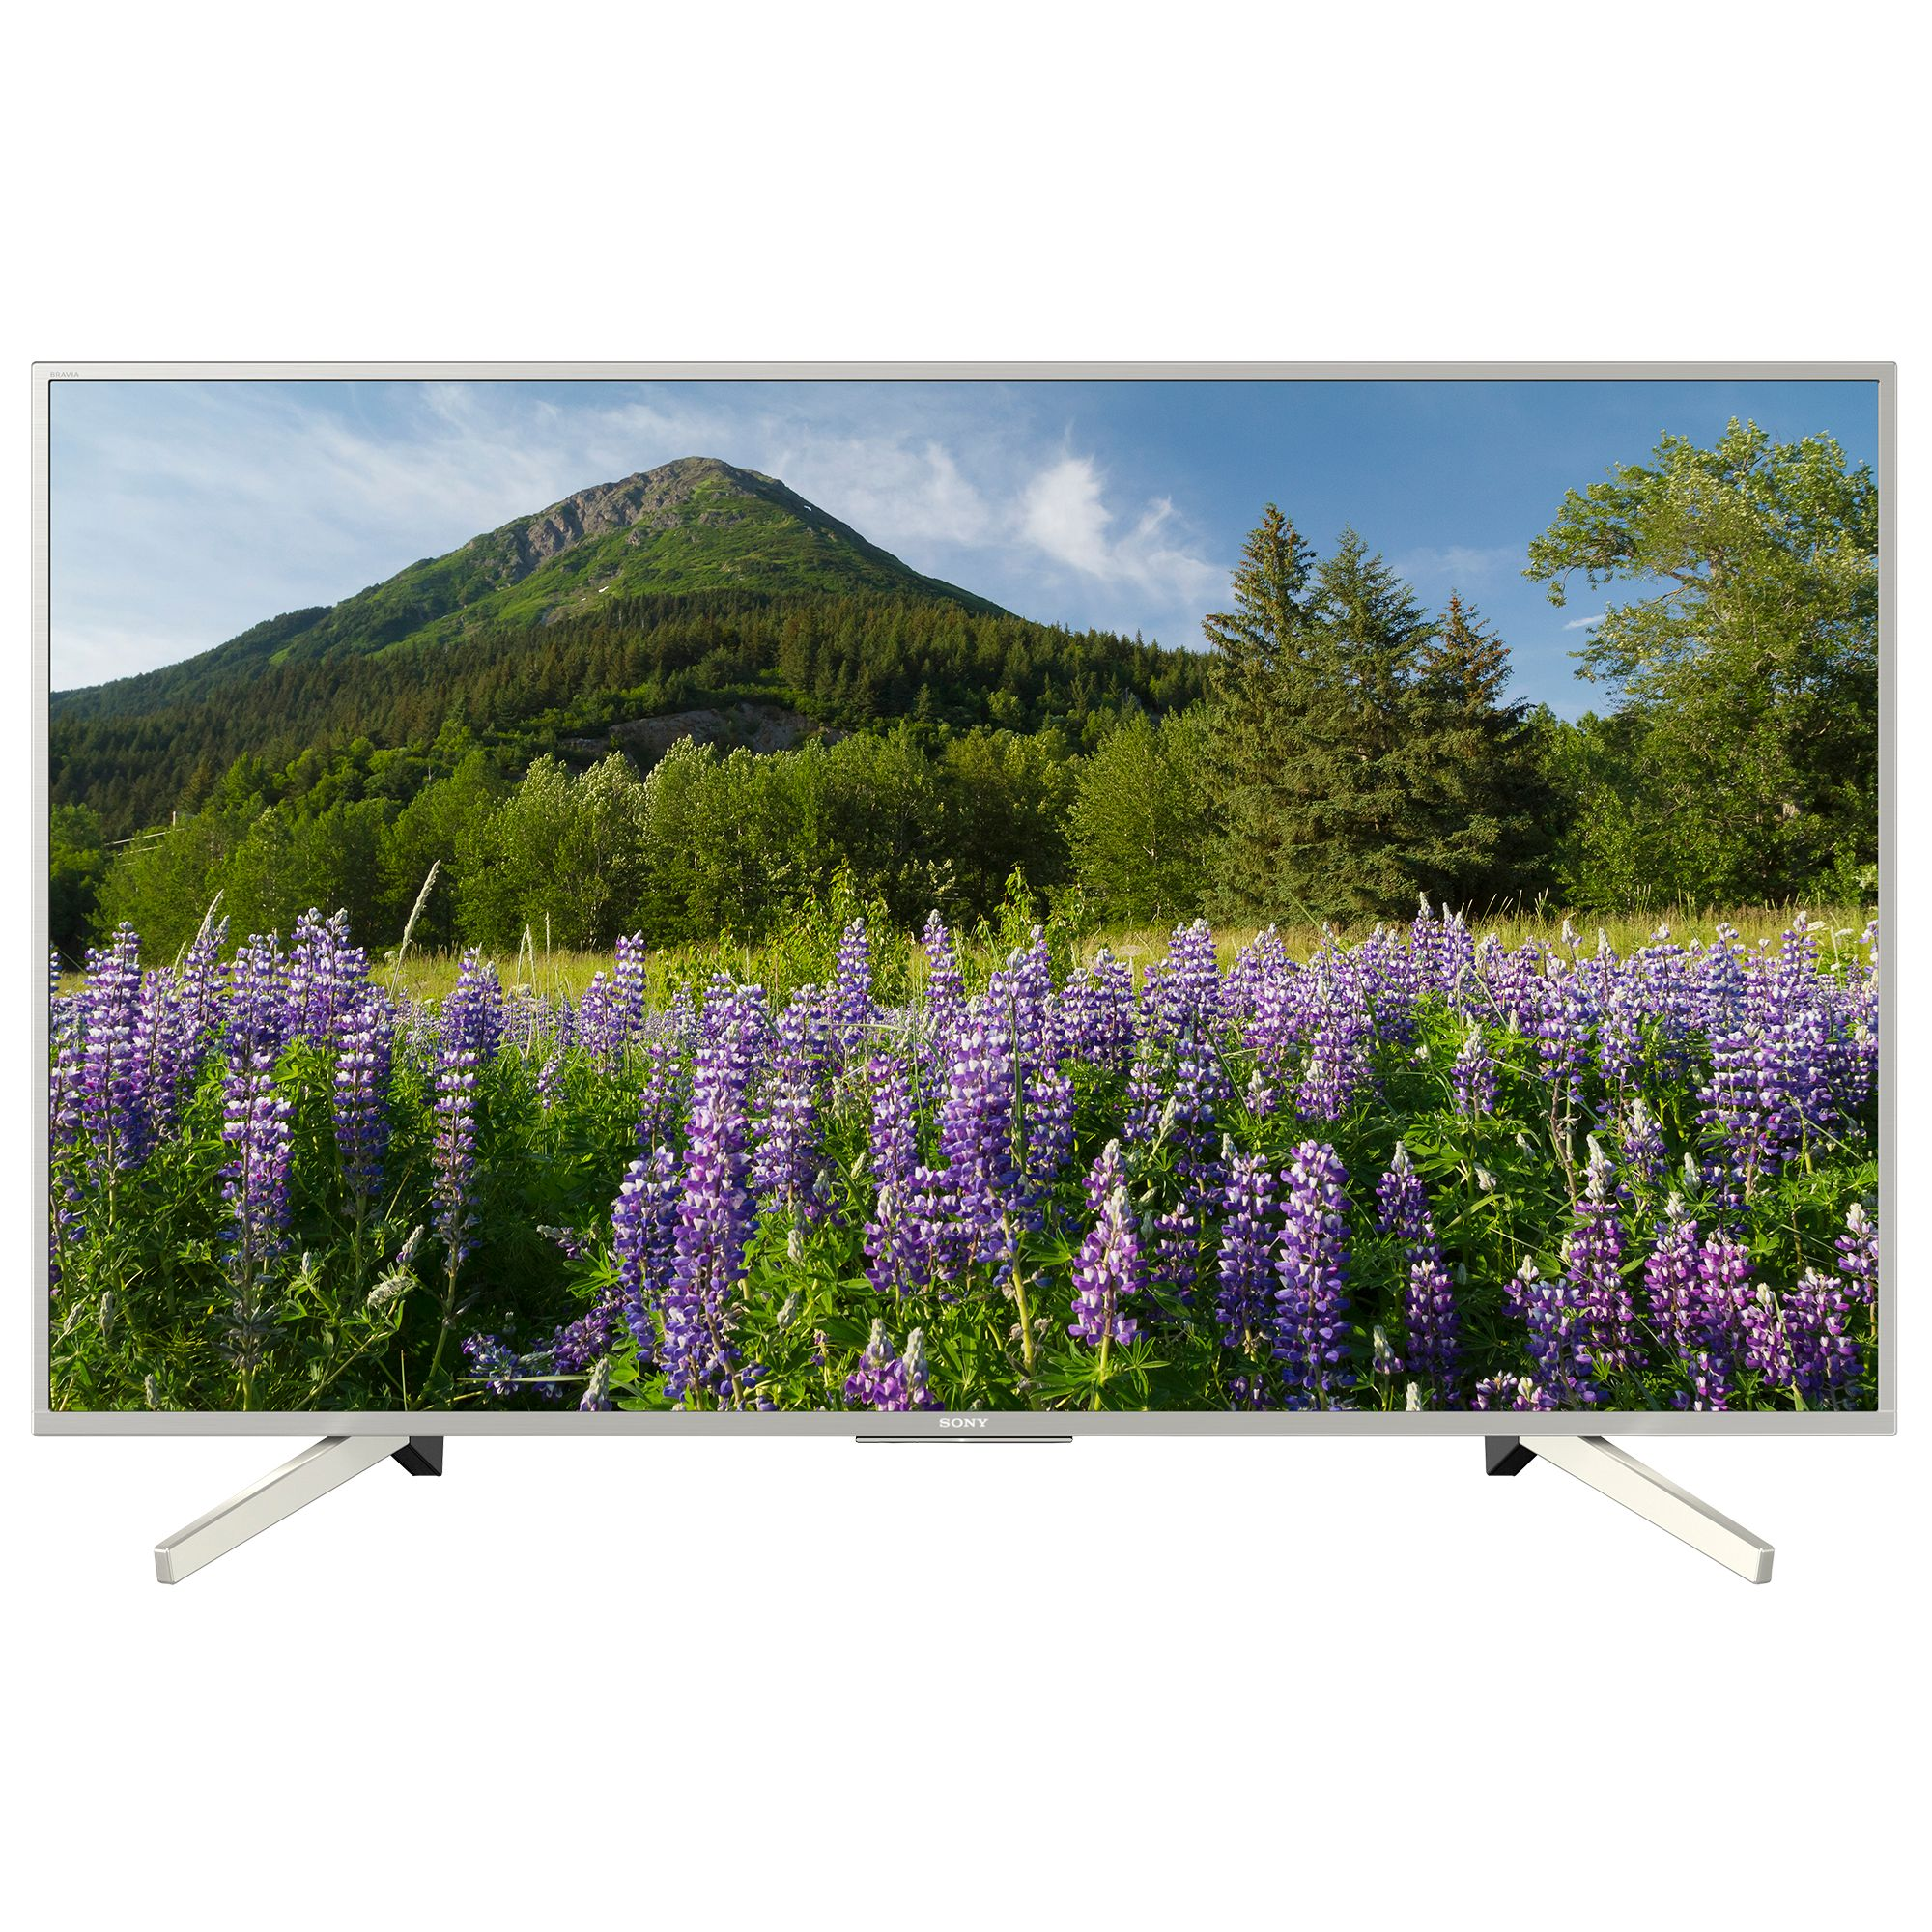 Televizor LED Sony Smart TV KD-43XF7077 108cm 4K Ultra HD HDR Argintiu